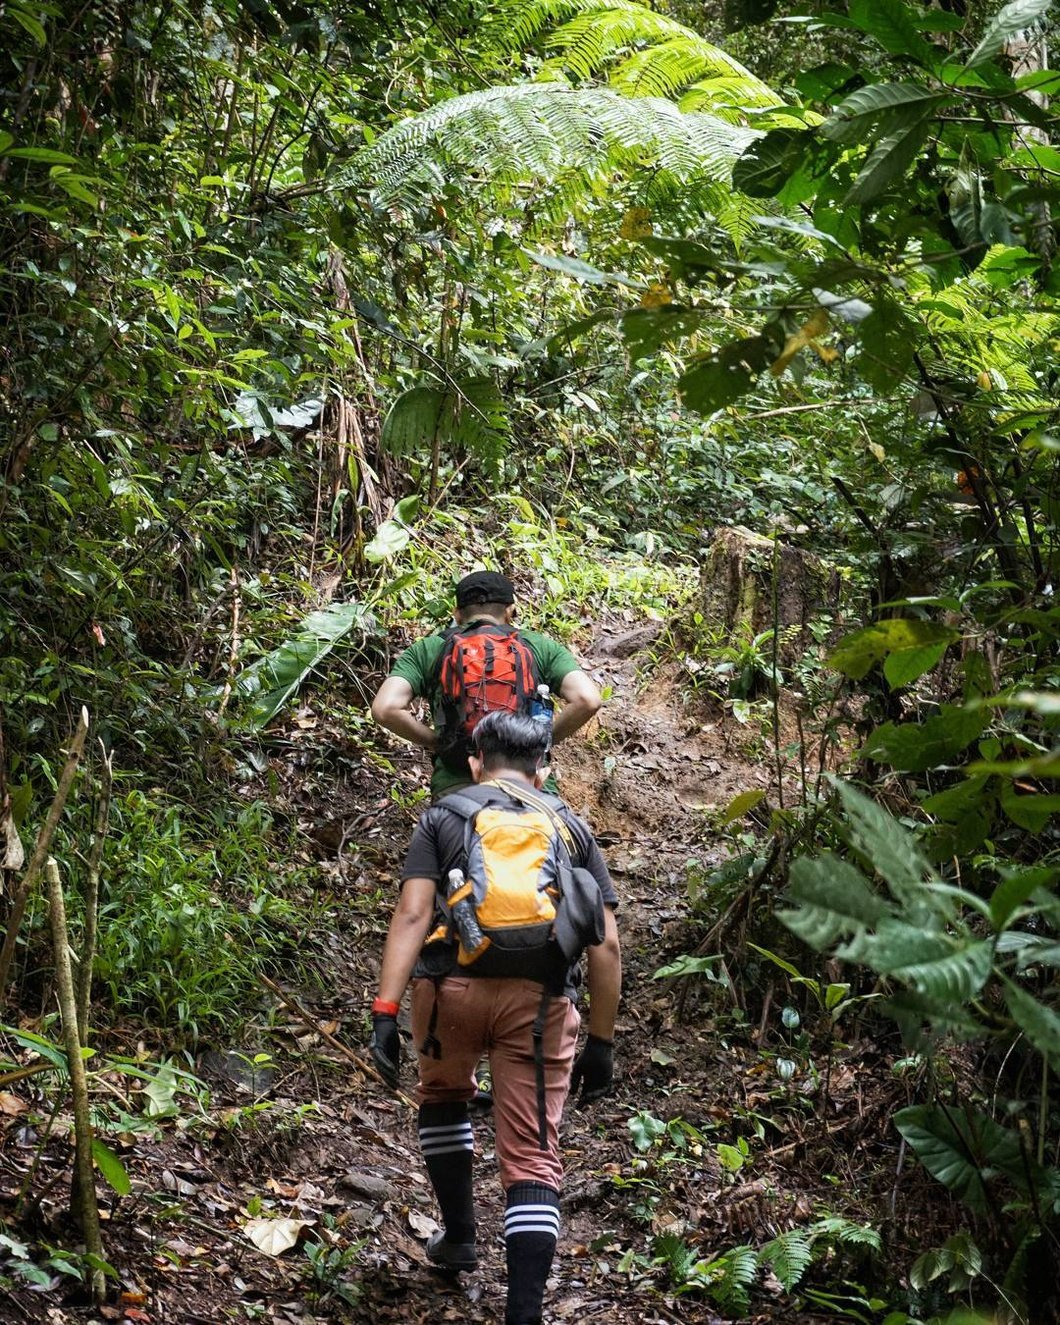 Photo: Hiking trail at Tinorindak Hill. Photo credit @eddo.ig